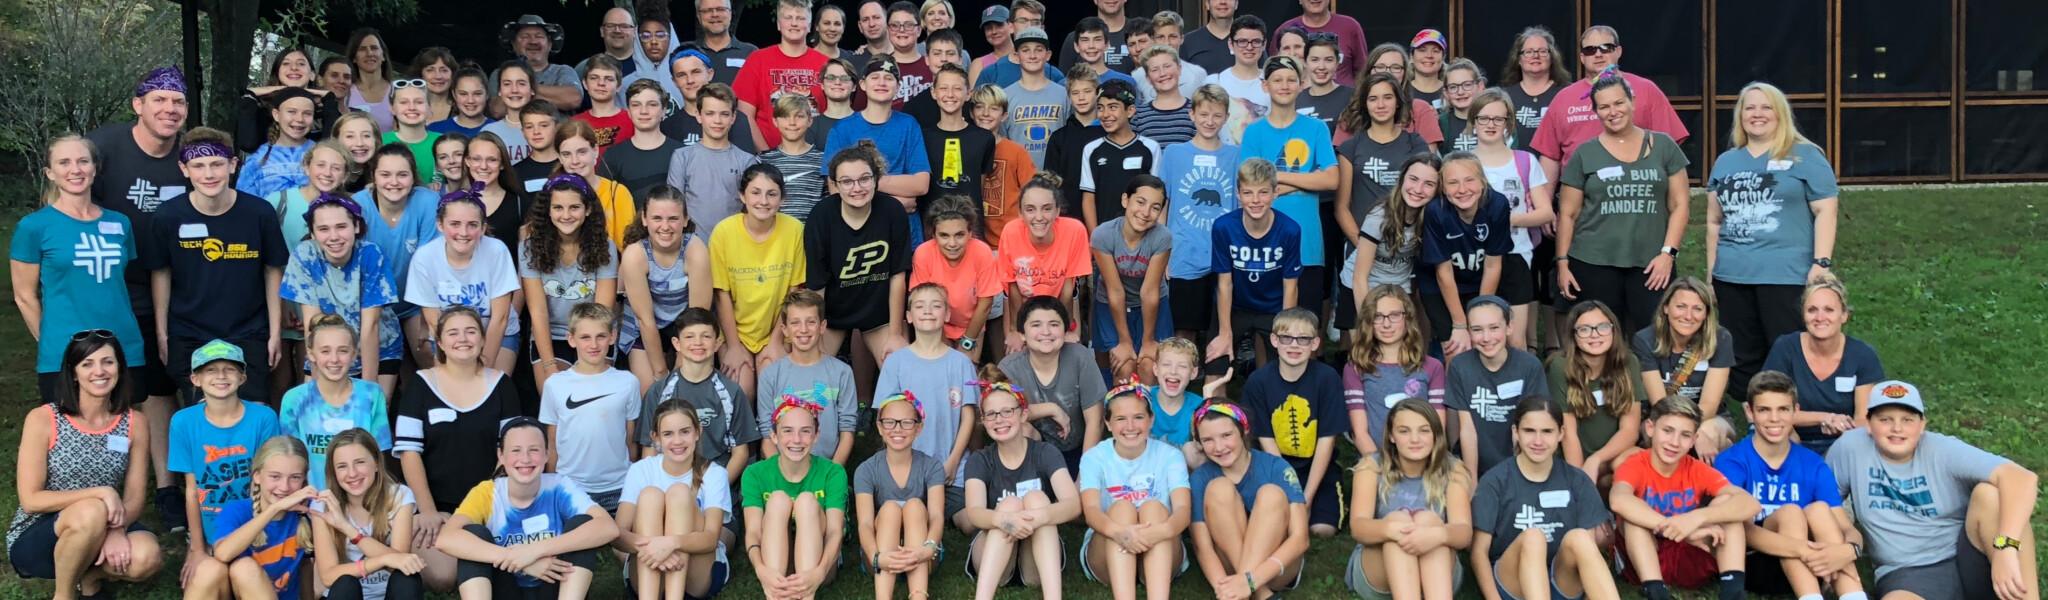 Grades 7-8 | Cornerstone Lutheran Church | Cornerstone Lutheran Church